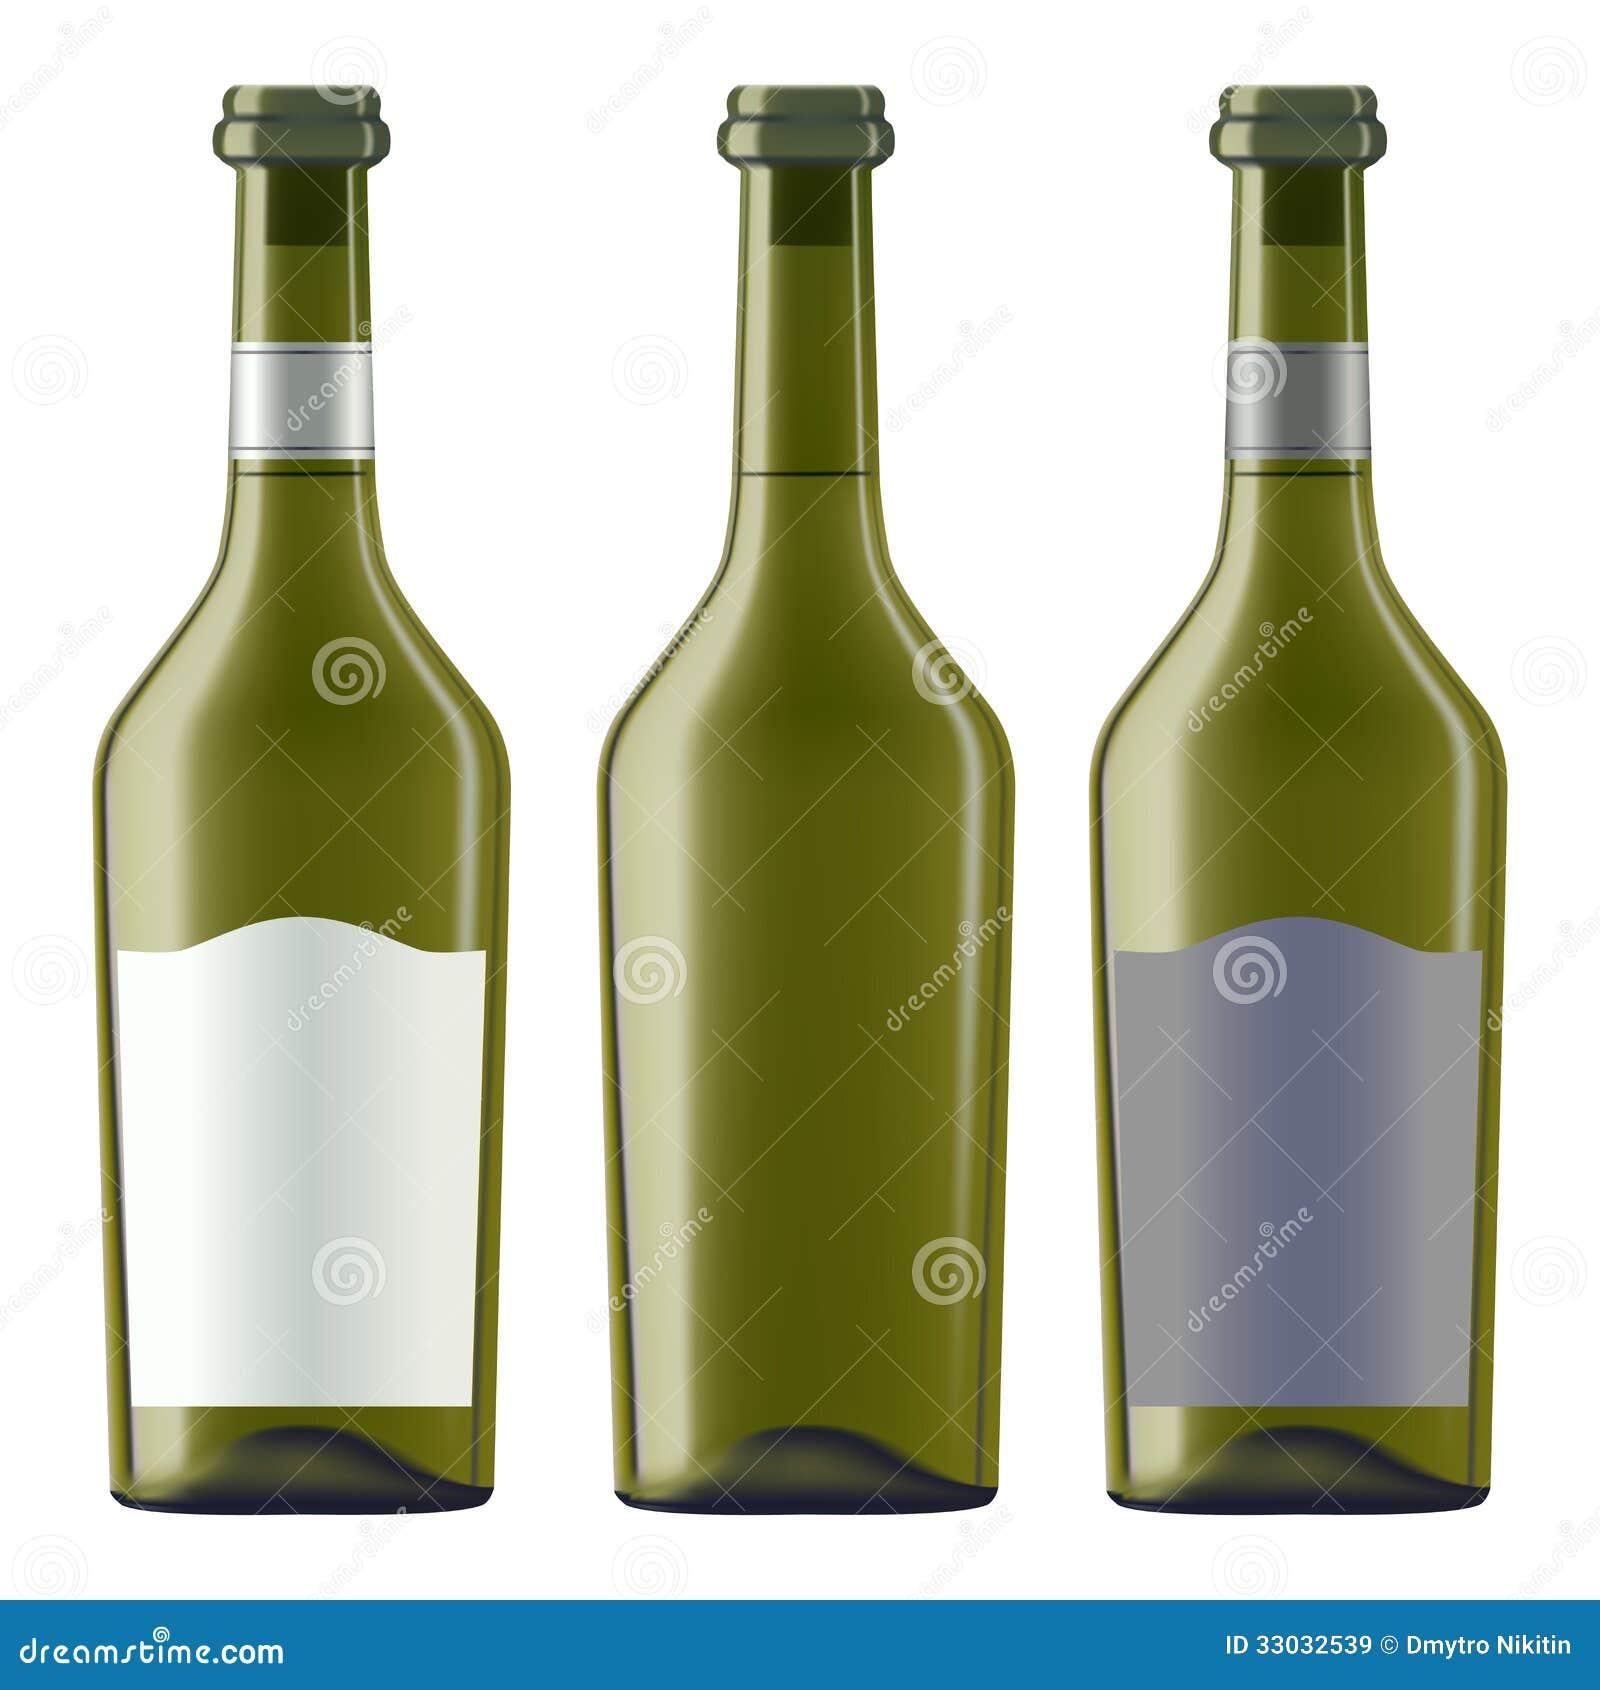 Bottles Of White Wine Royalty Free Stock Images - Image ...